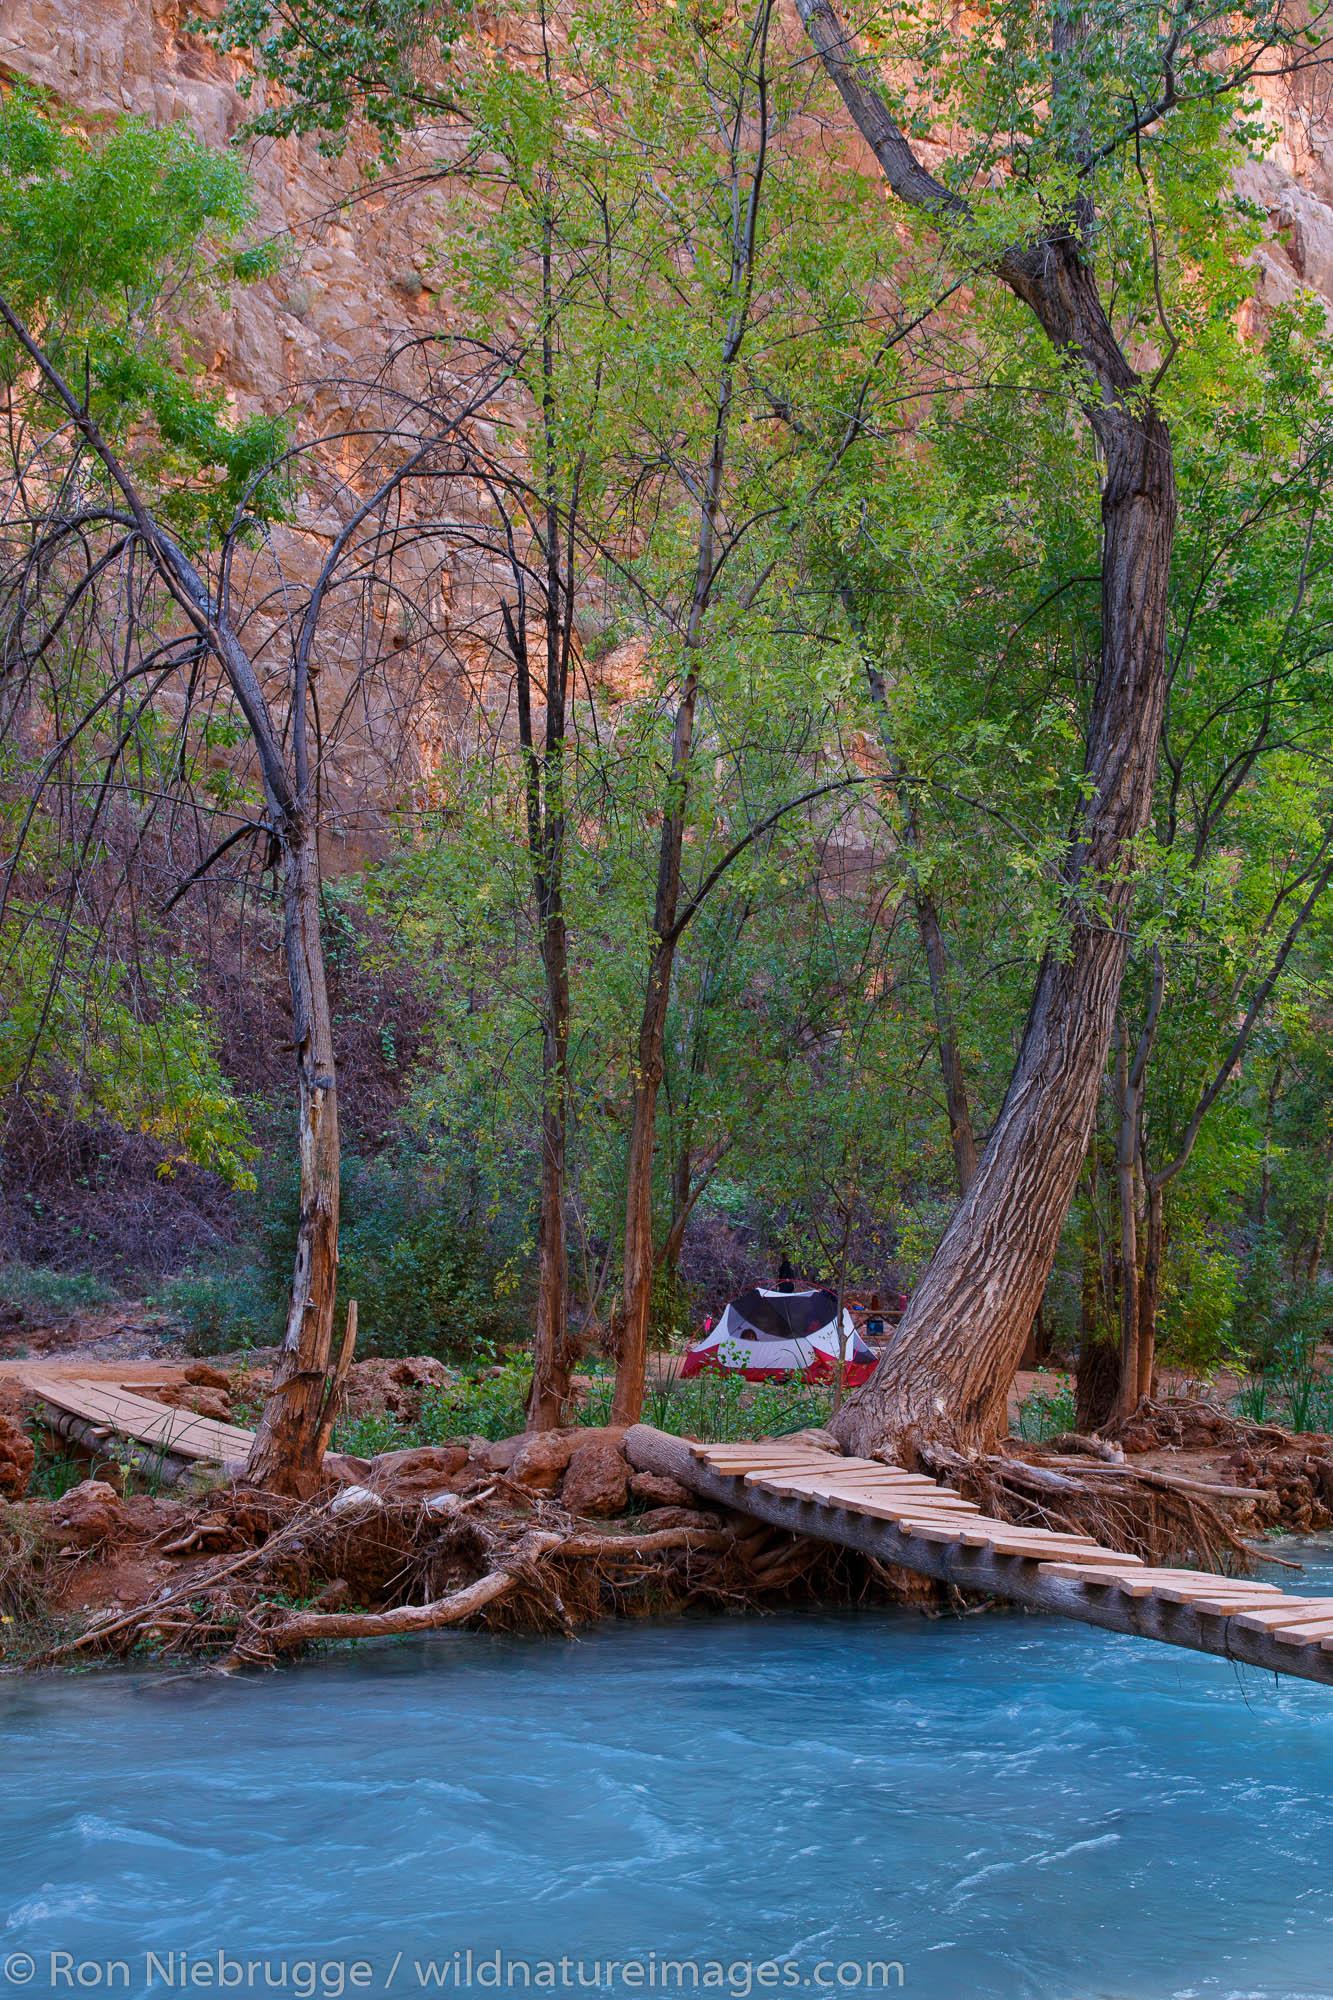 Campground at the base of Havasu Falls, Havasupai Indian Reservation, Grand Canyon, Arizona.